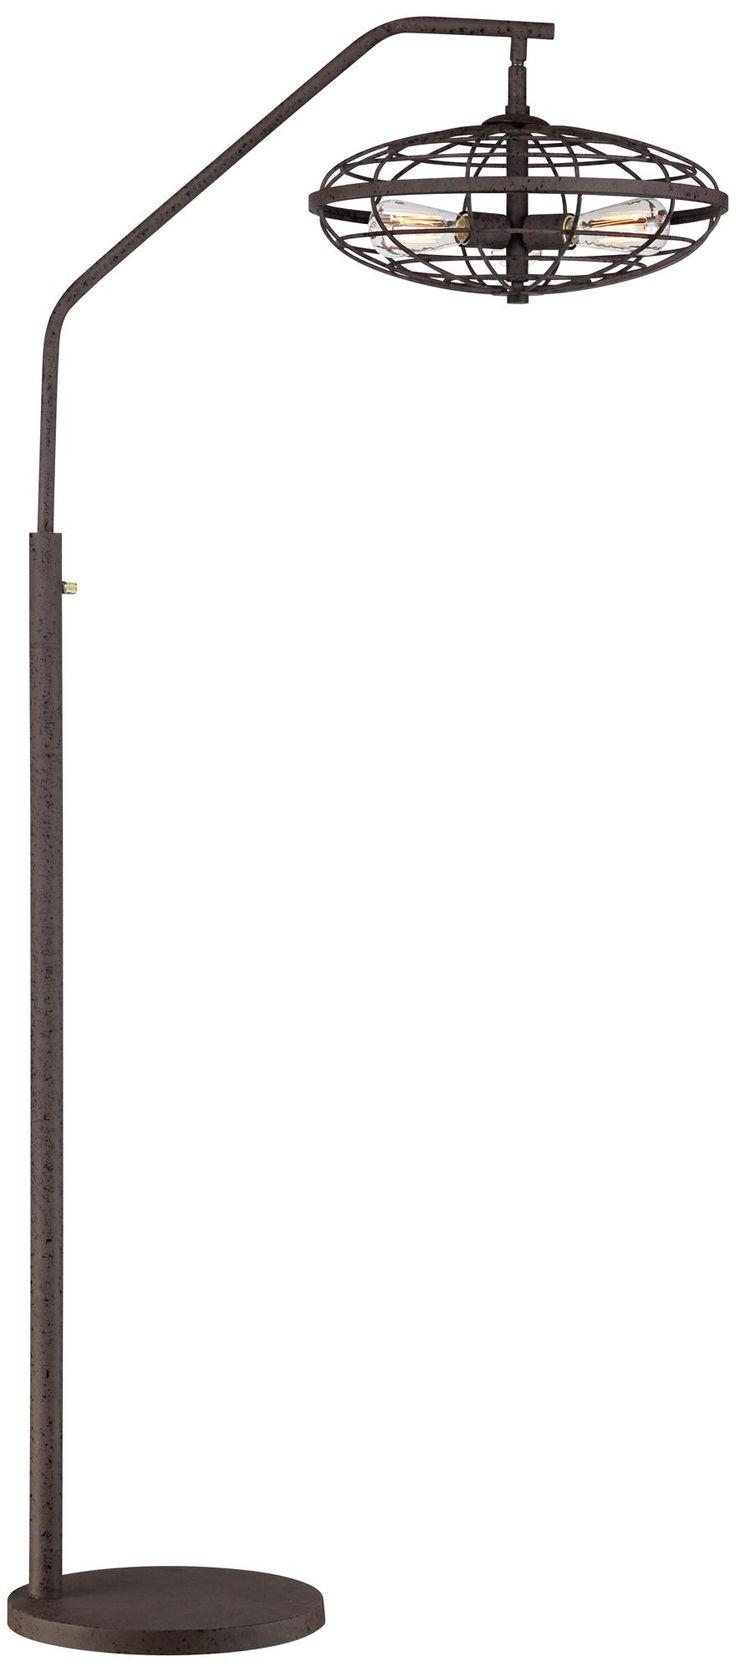 Industrial Cage 3-Light Arc Rust Floor Lamp -